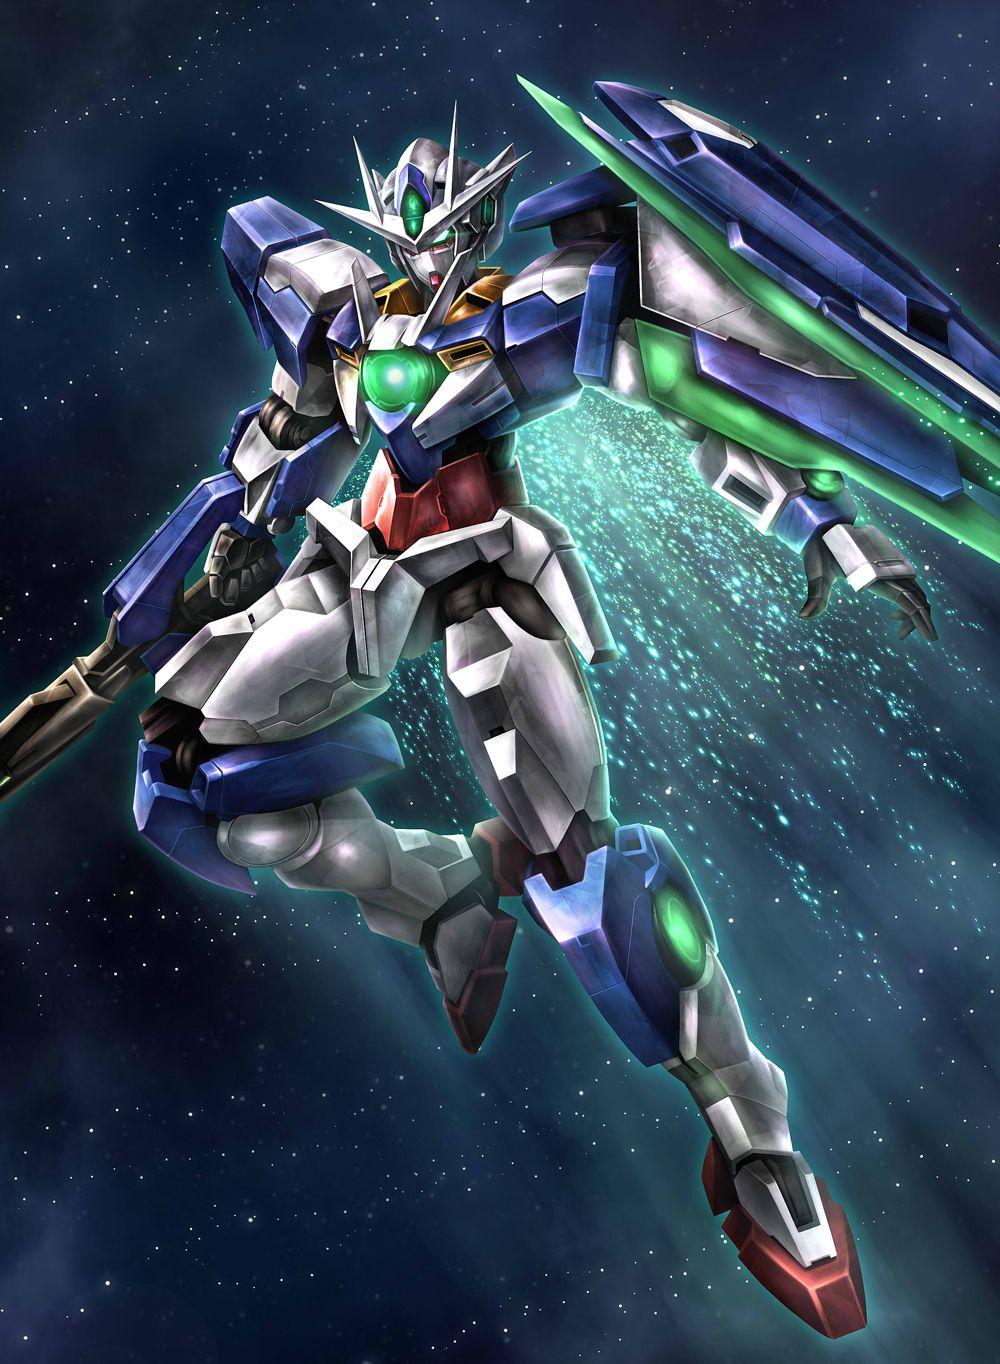 Gundam Guy Awesome Gundam Digital Artworks Updated 8 7 16 In 2020 Gundam Wallpapers Gundam Exia Gundam Gundam exia wallpaper 4k